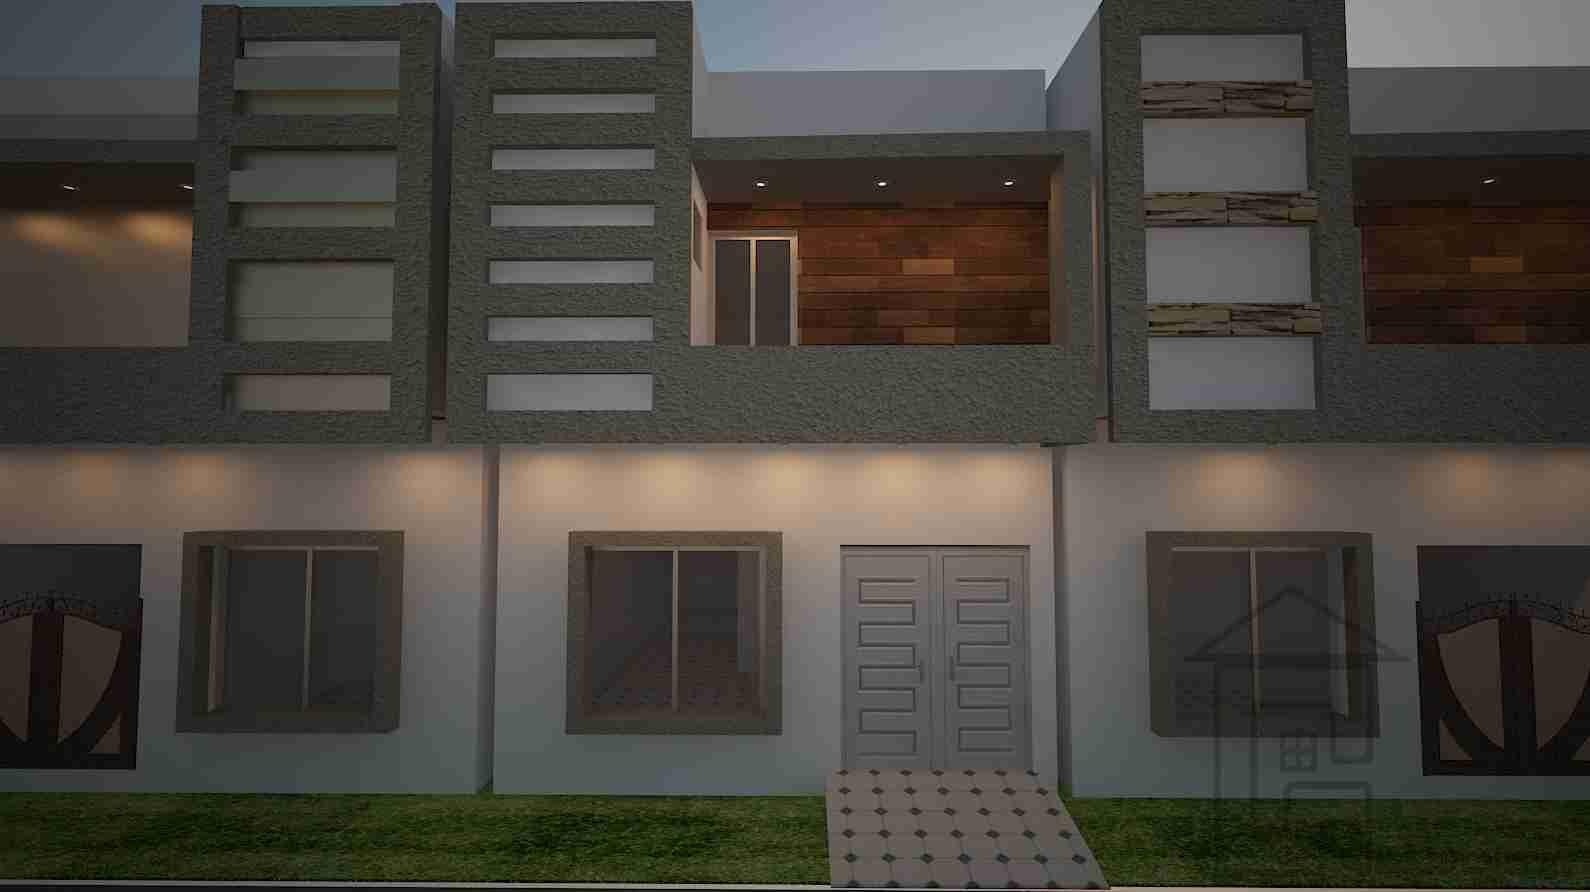 2 marla house design plan front elevation 2 marla house plan